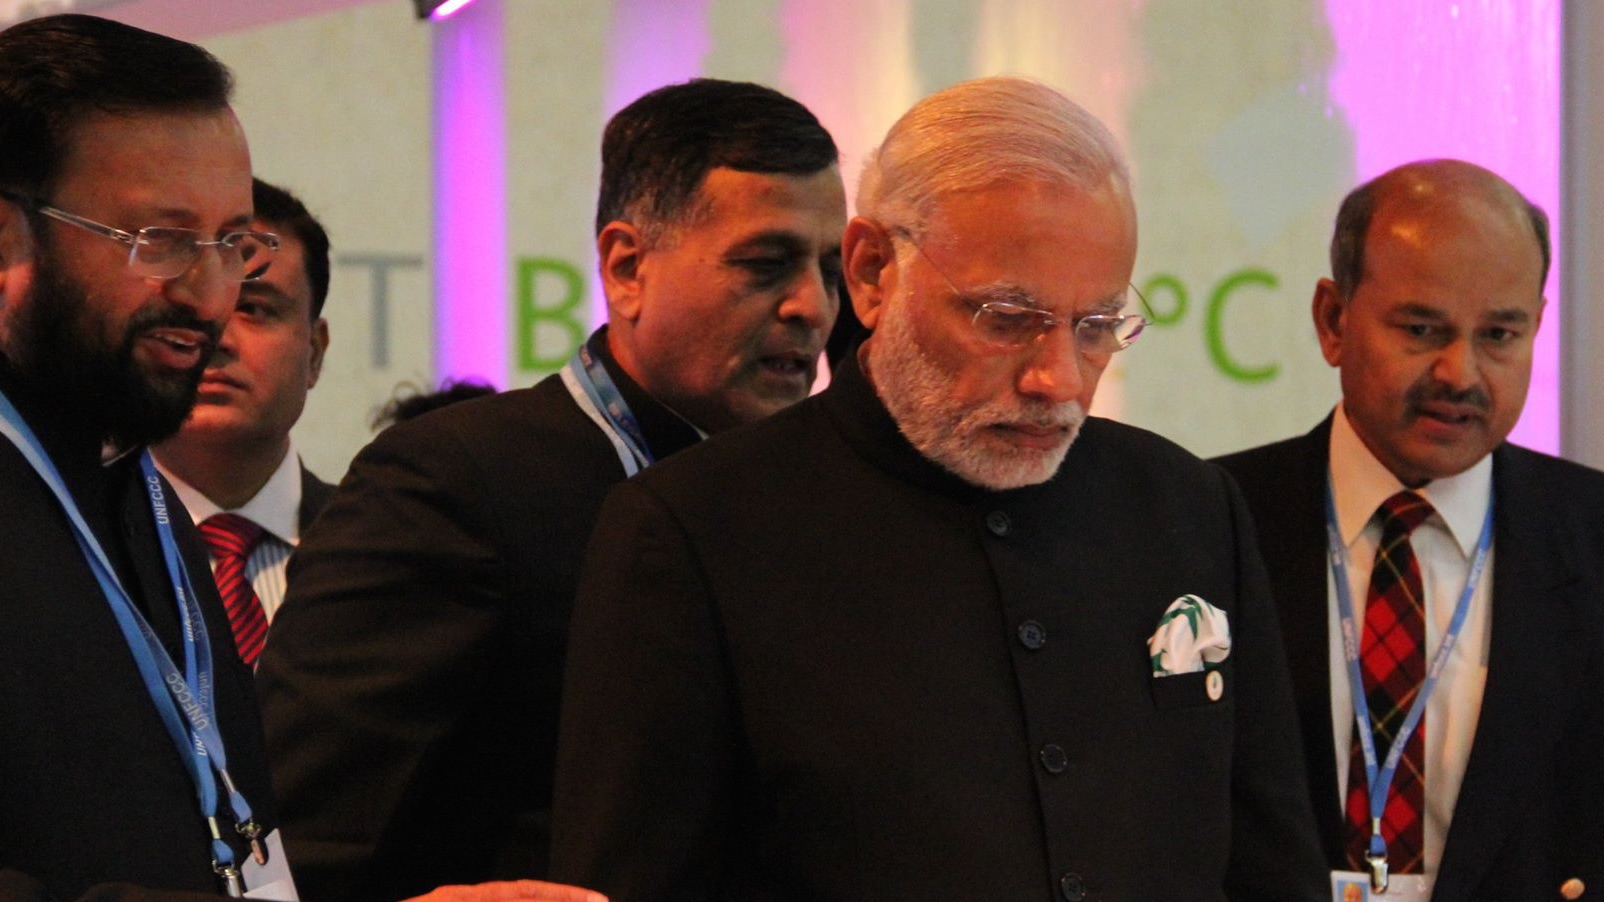 Lead India negotiator Susheel Kumar (far right) with Indian prime minister Narendra Modi (Pic: Avik Roy)